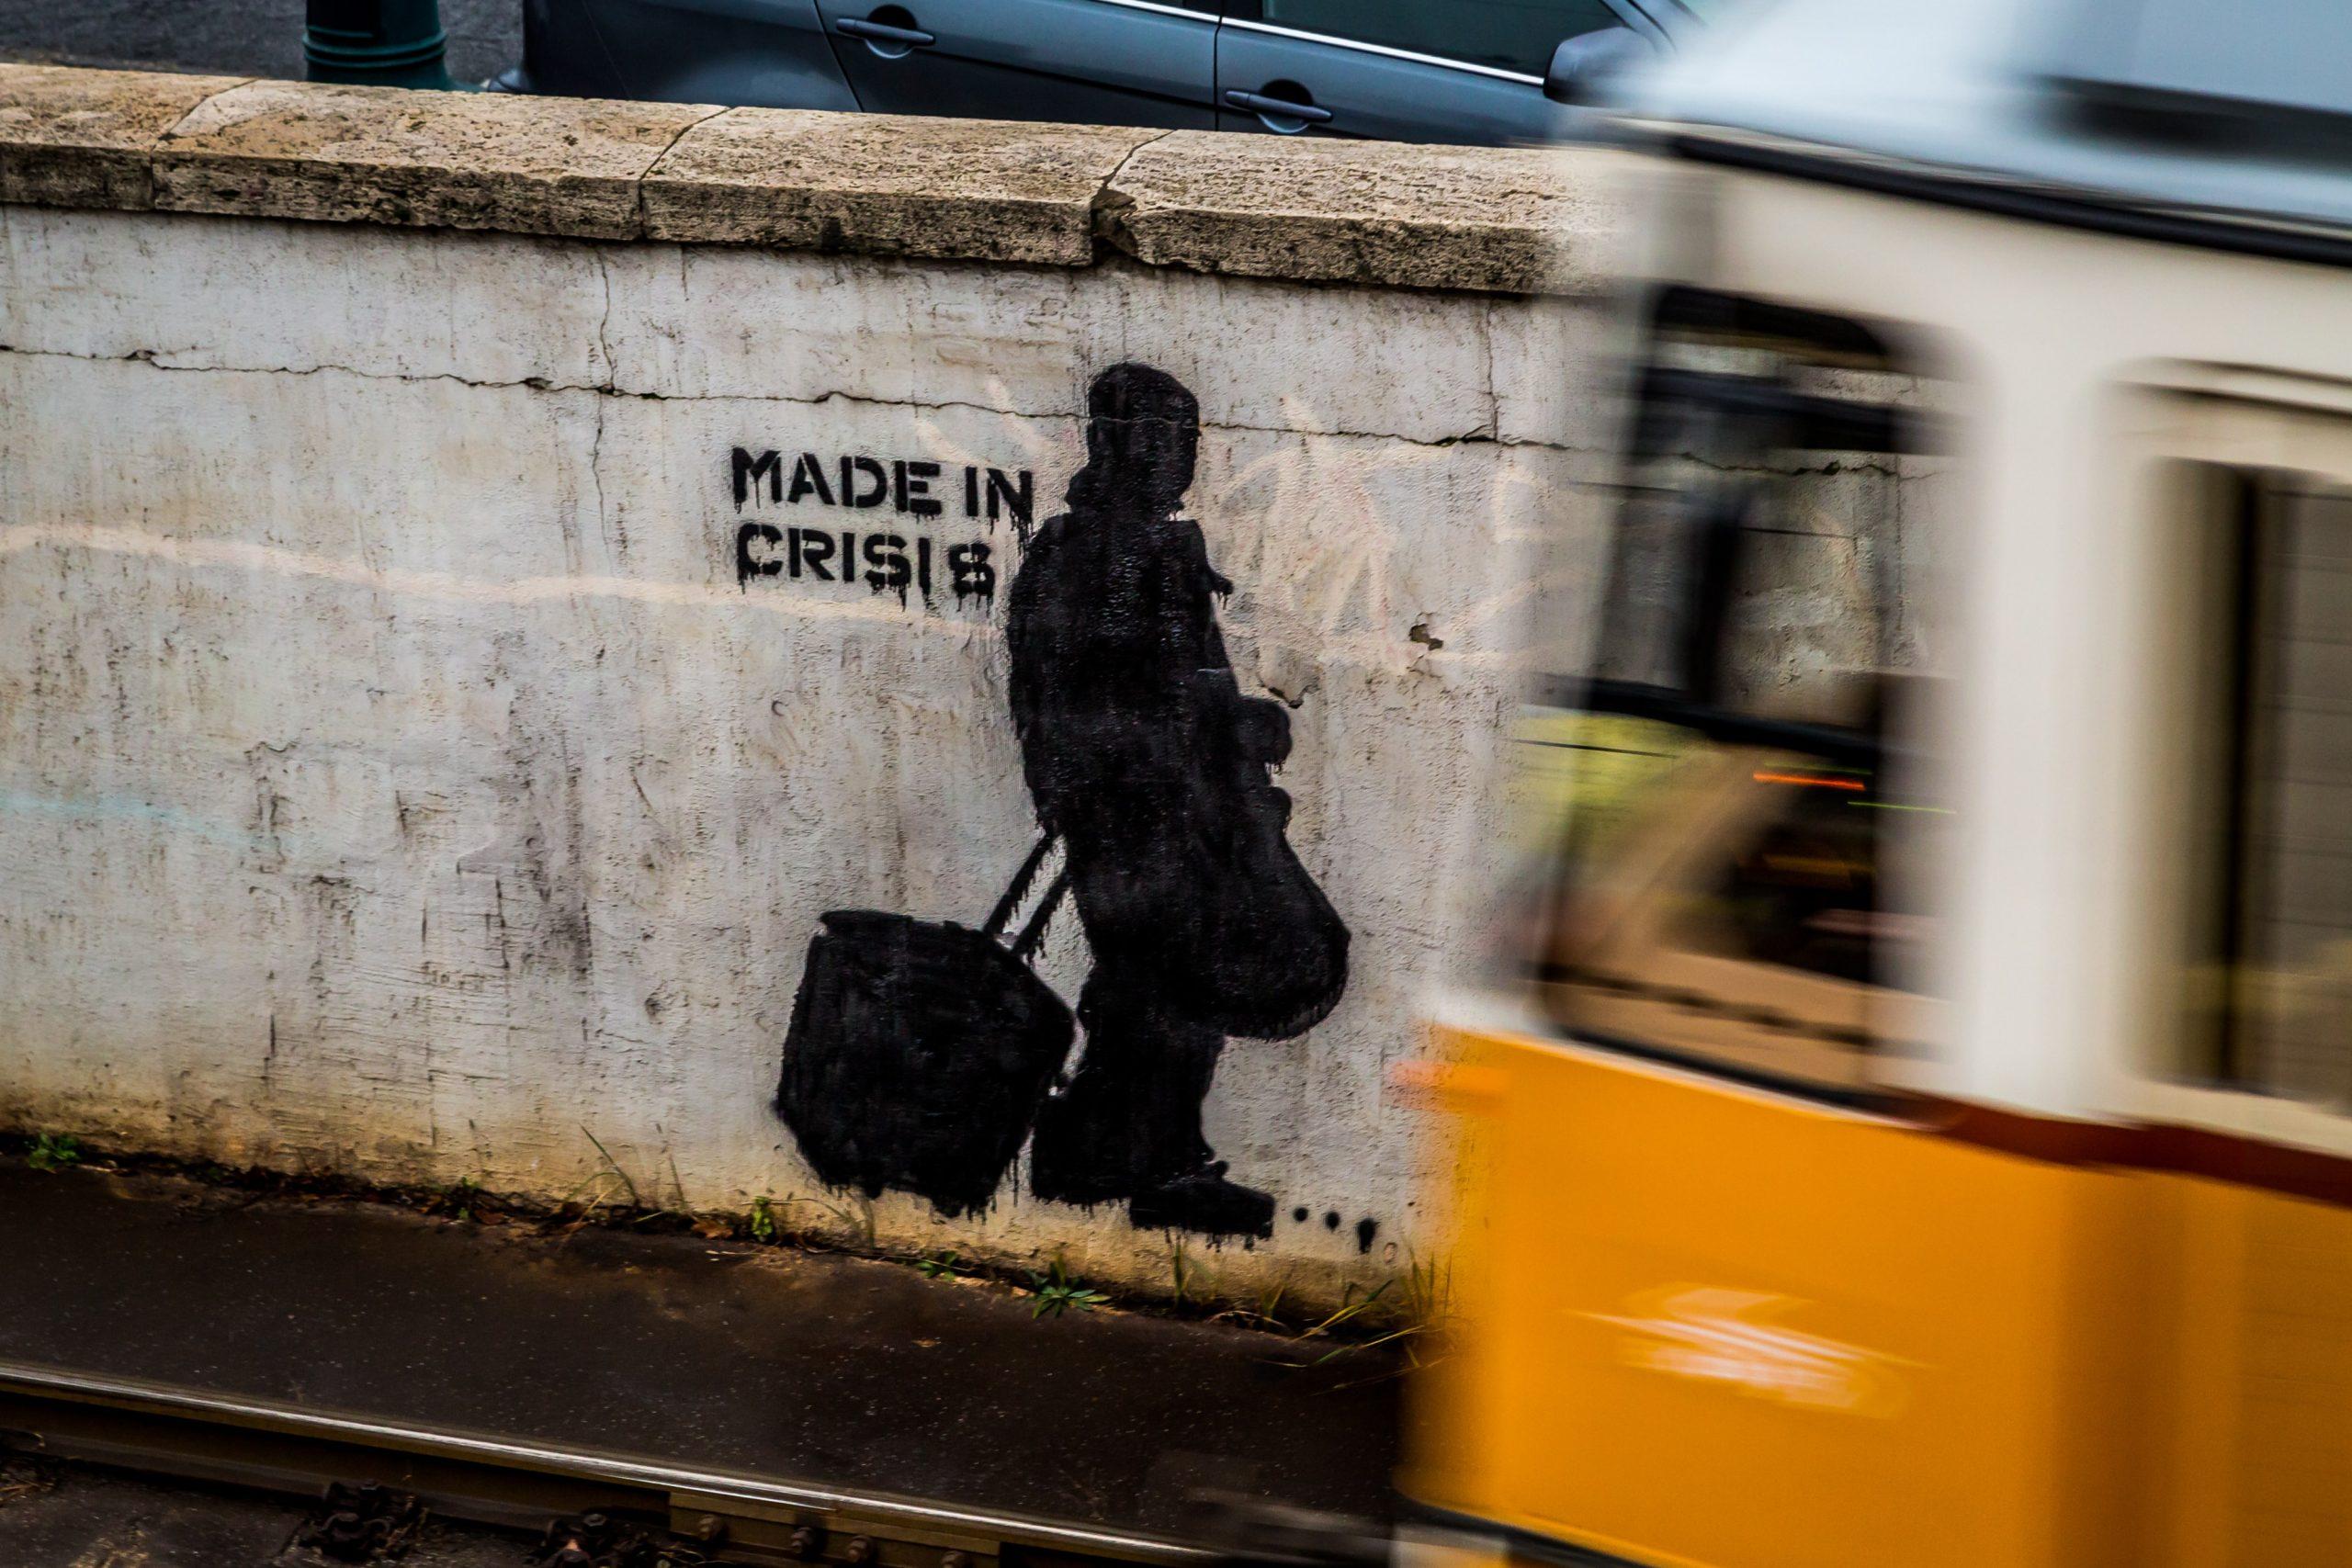 Photo by Robert Metz on Unsplash